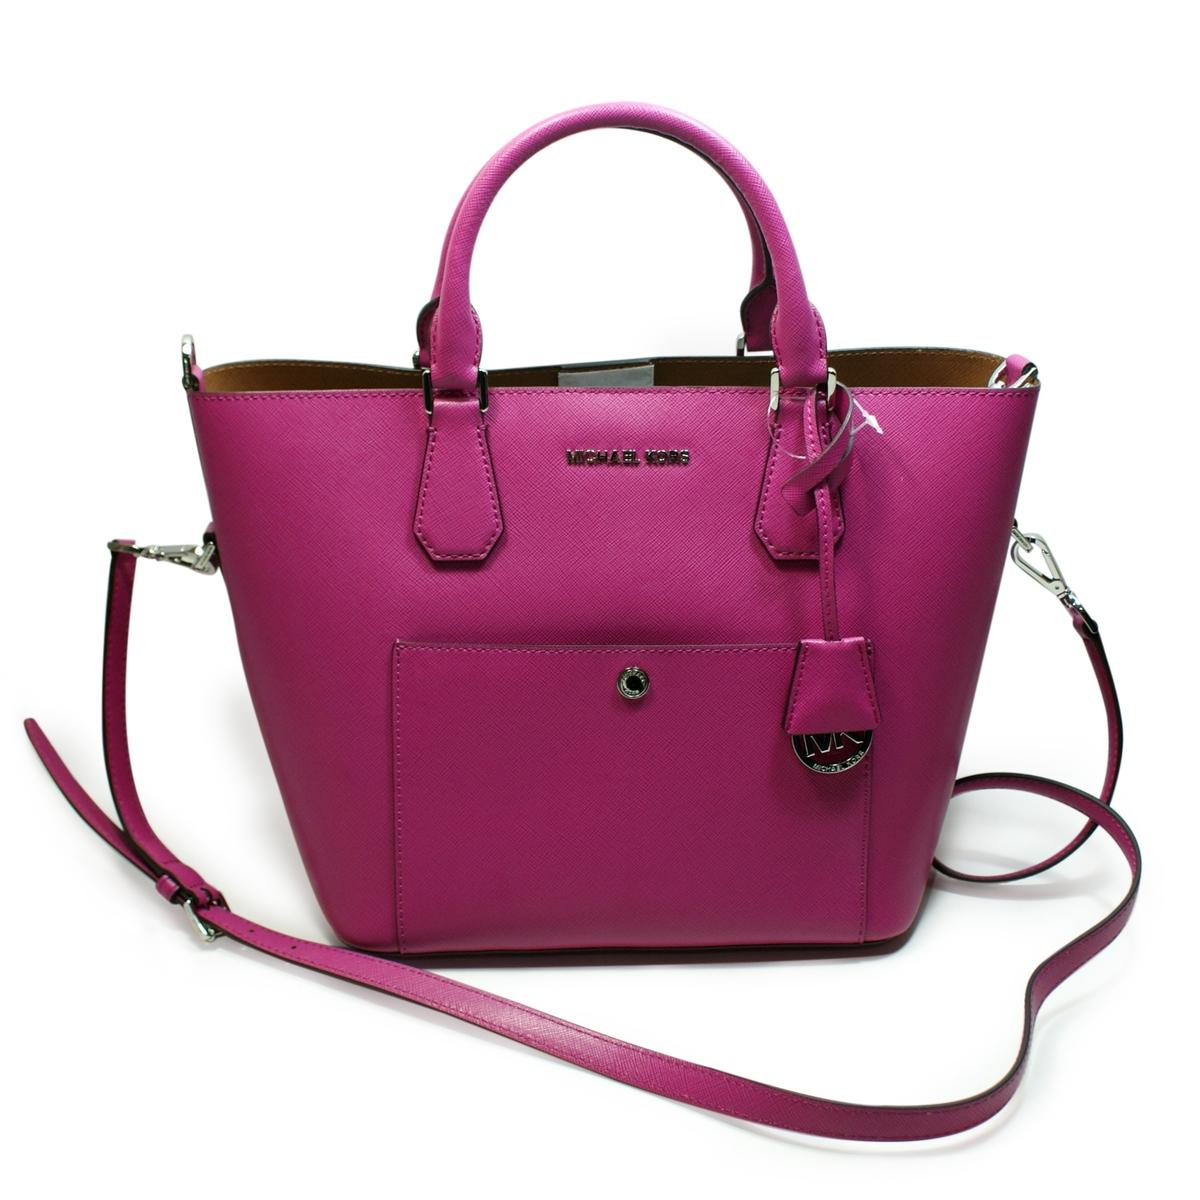 8b5f8b43cbd529 Michael Kors Greenwich Leather Grab Bag/ Crossbody Bag Fuschia ...